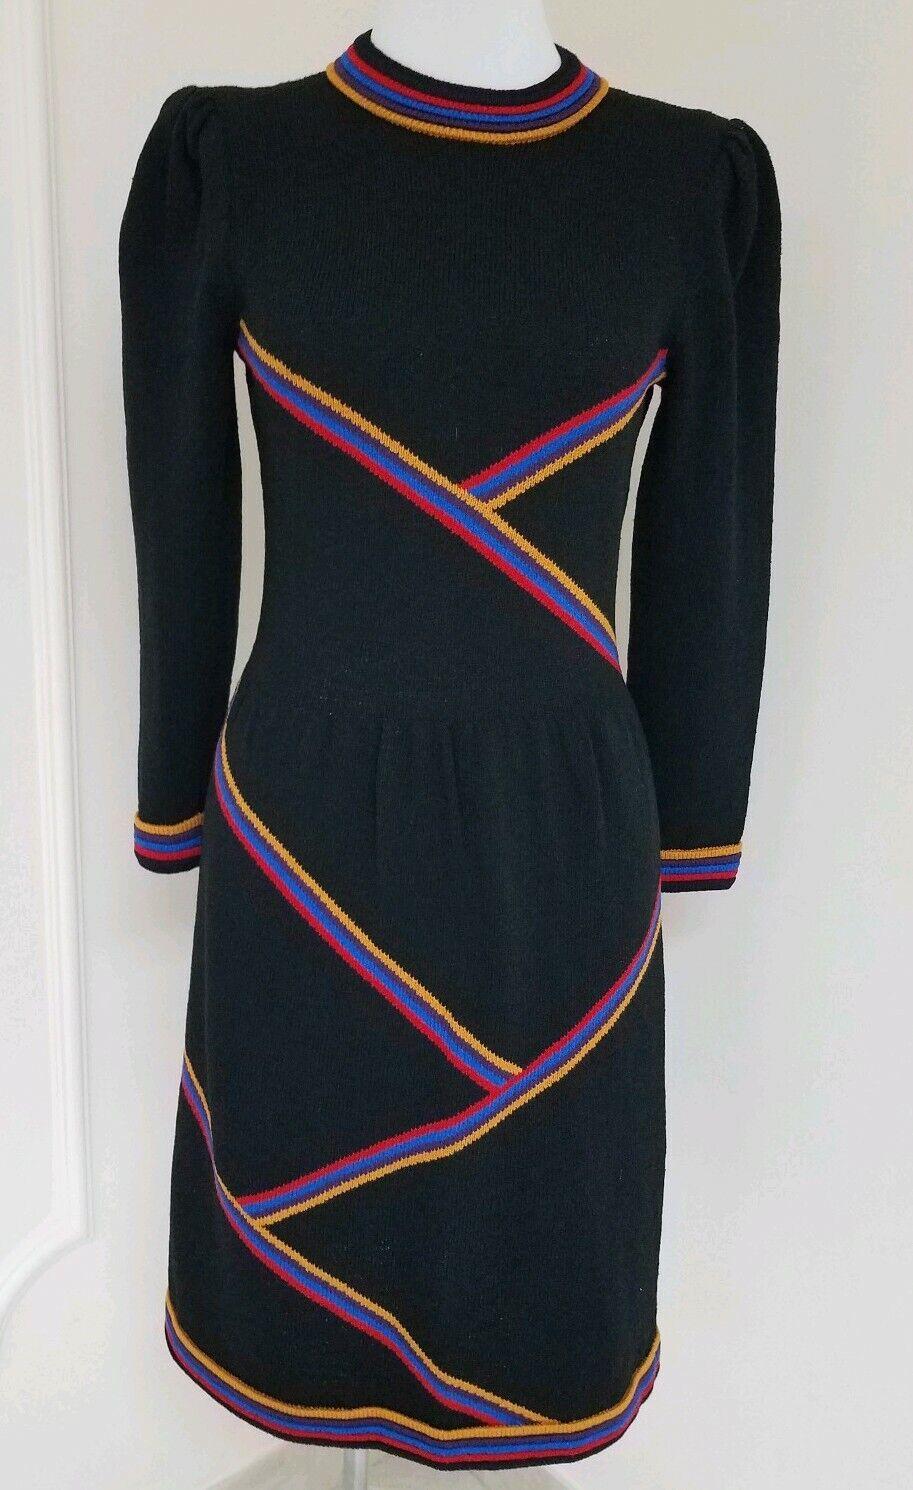 Vintage ADOLFO Santana knit dress Größe--tag missing--seems like S-M